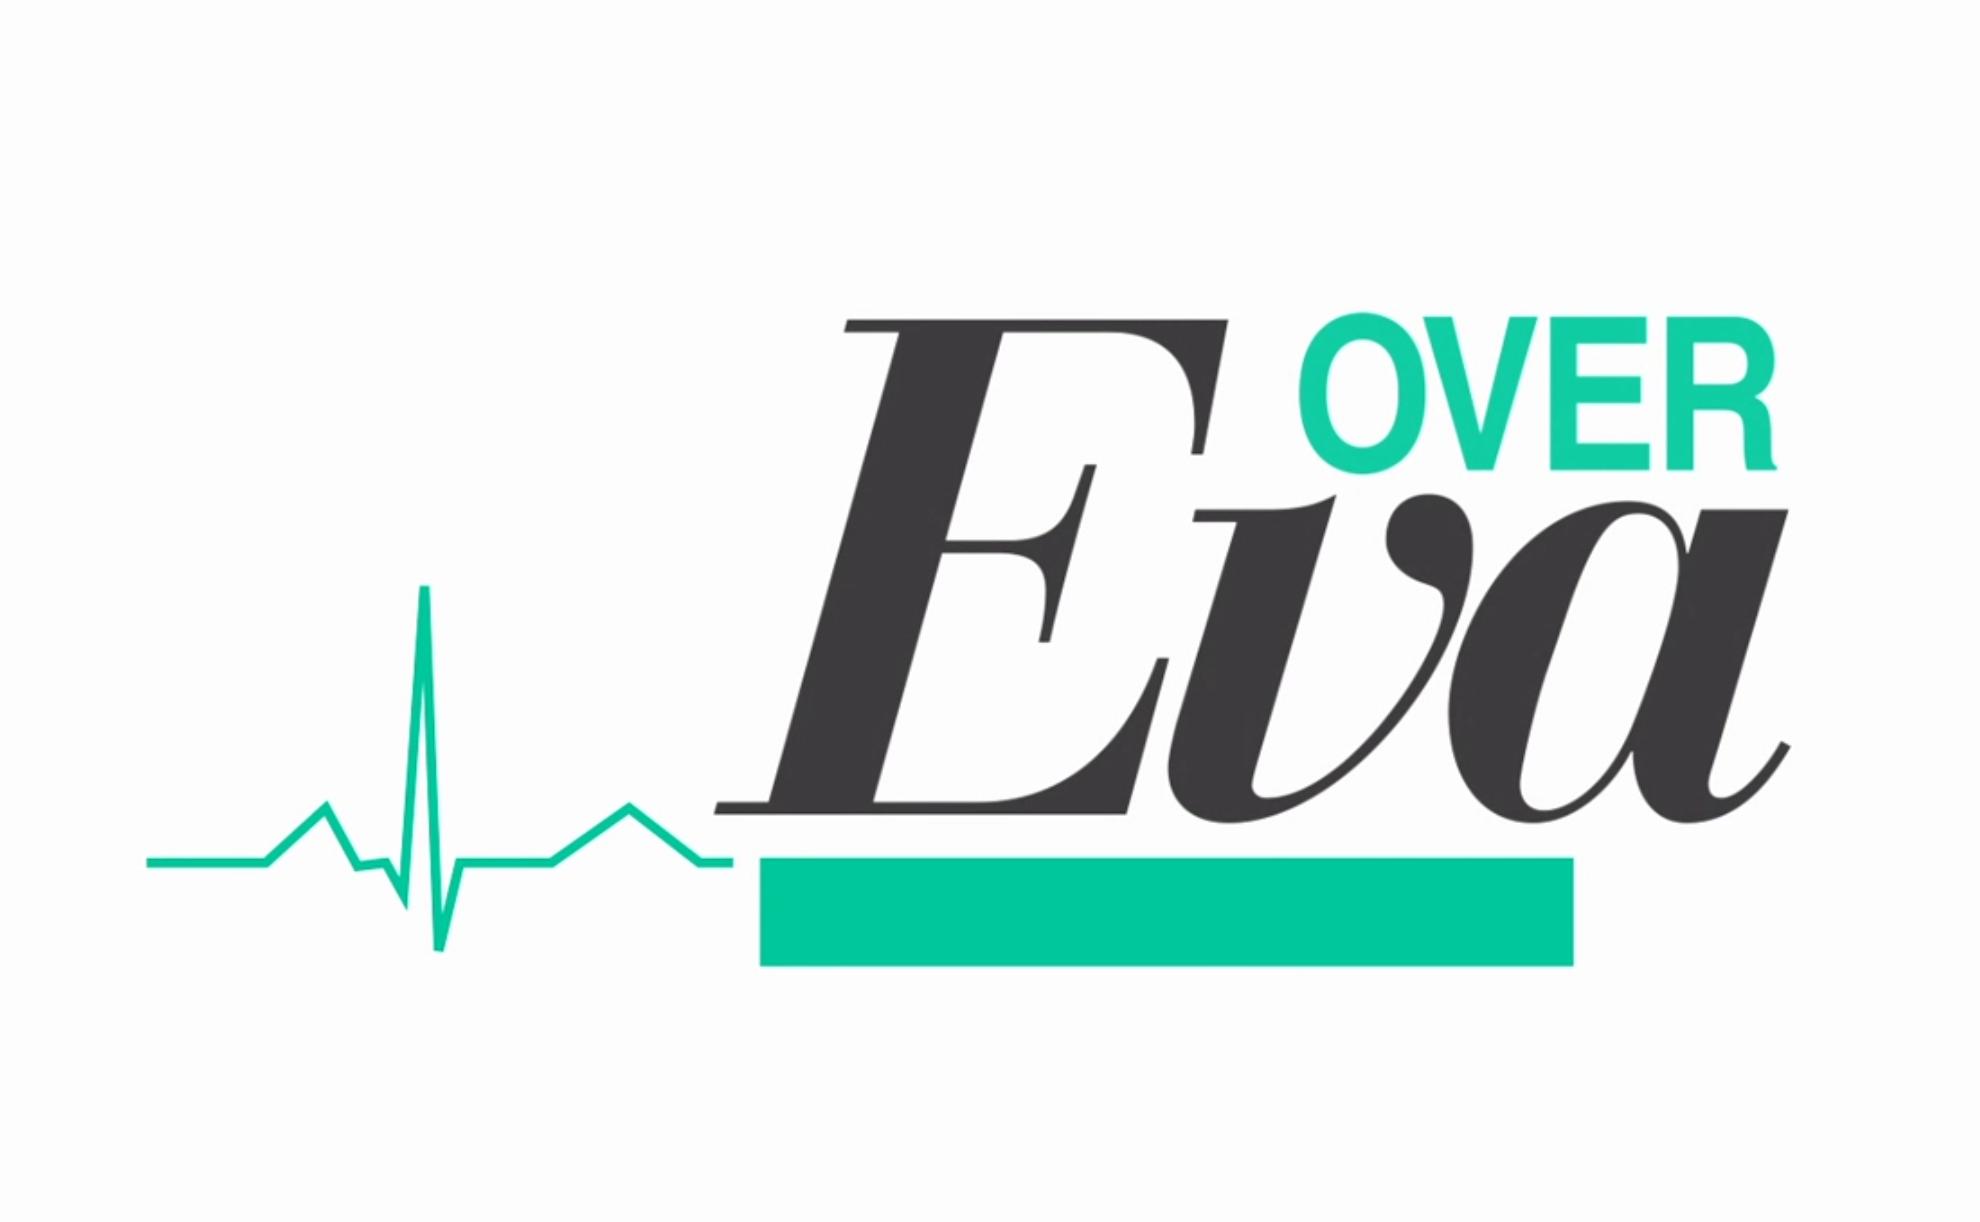 Over Eva aflevering #1 + 2: Verliest Eva alles?